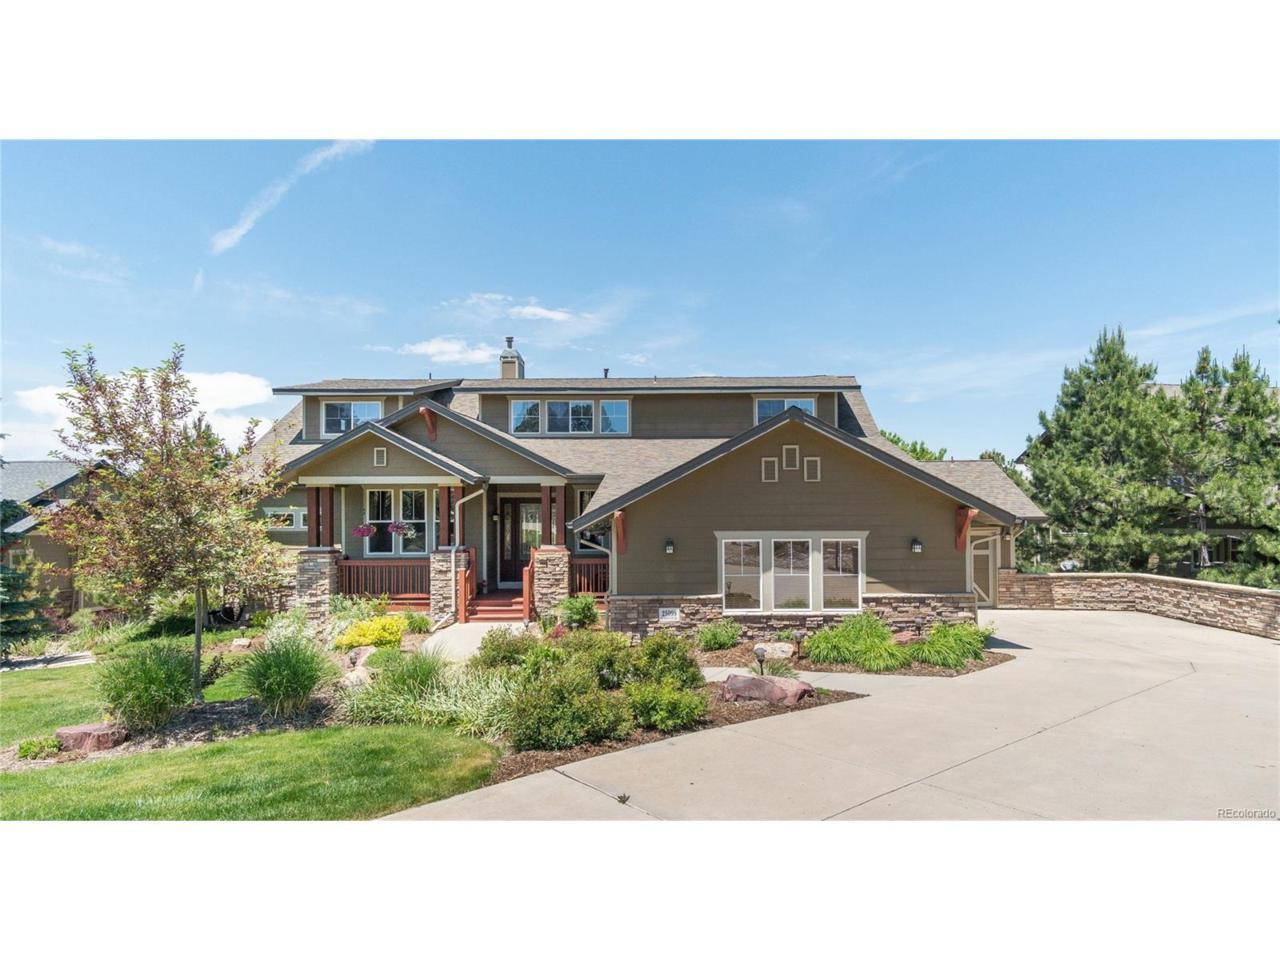 25099 E Plymouth Circle, Aurora, CO 80016 (MLS #2313259) :: 8z Real Estate